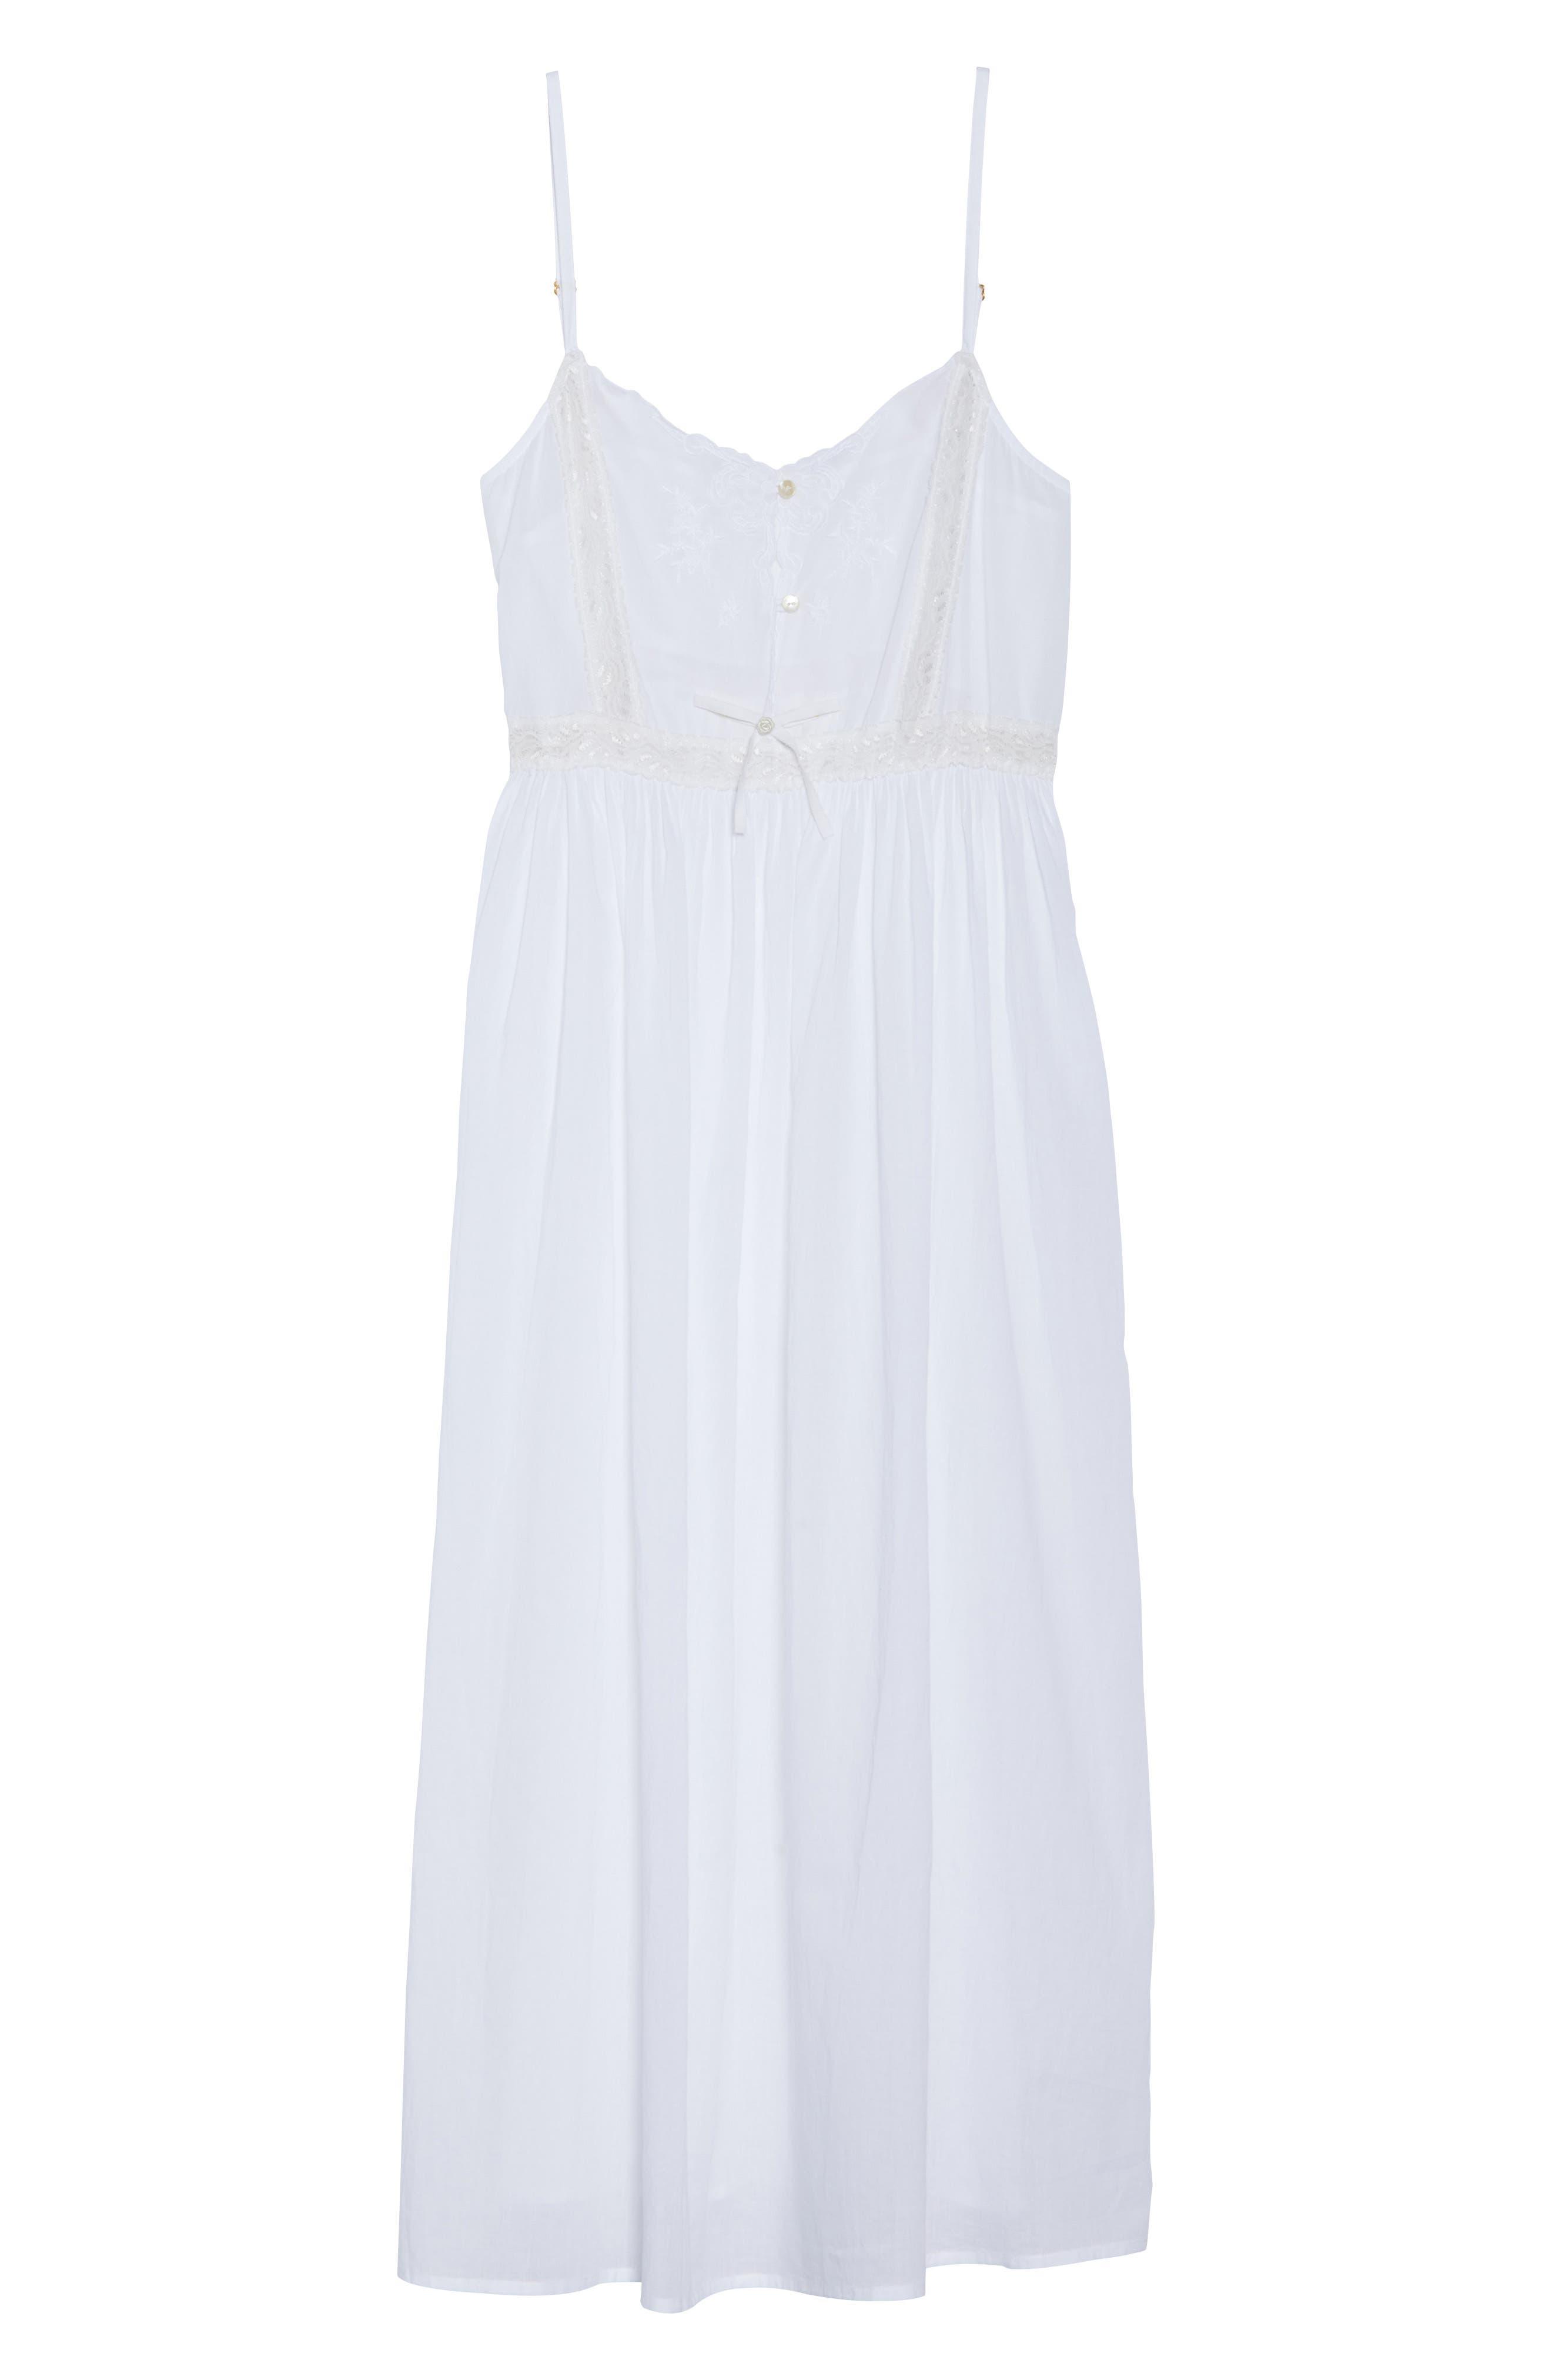 Lace Trim Nightgown,                             Alternate thumbnail 4, color,                             White